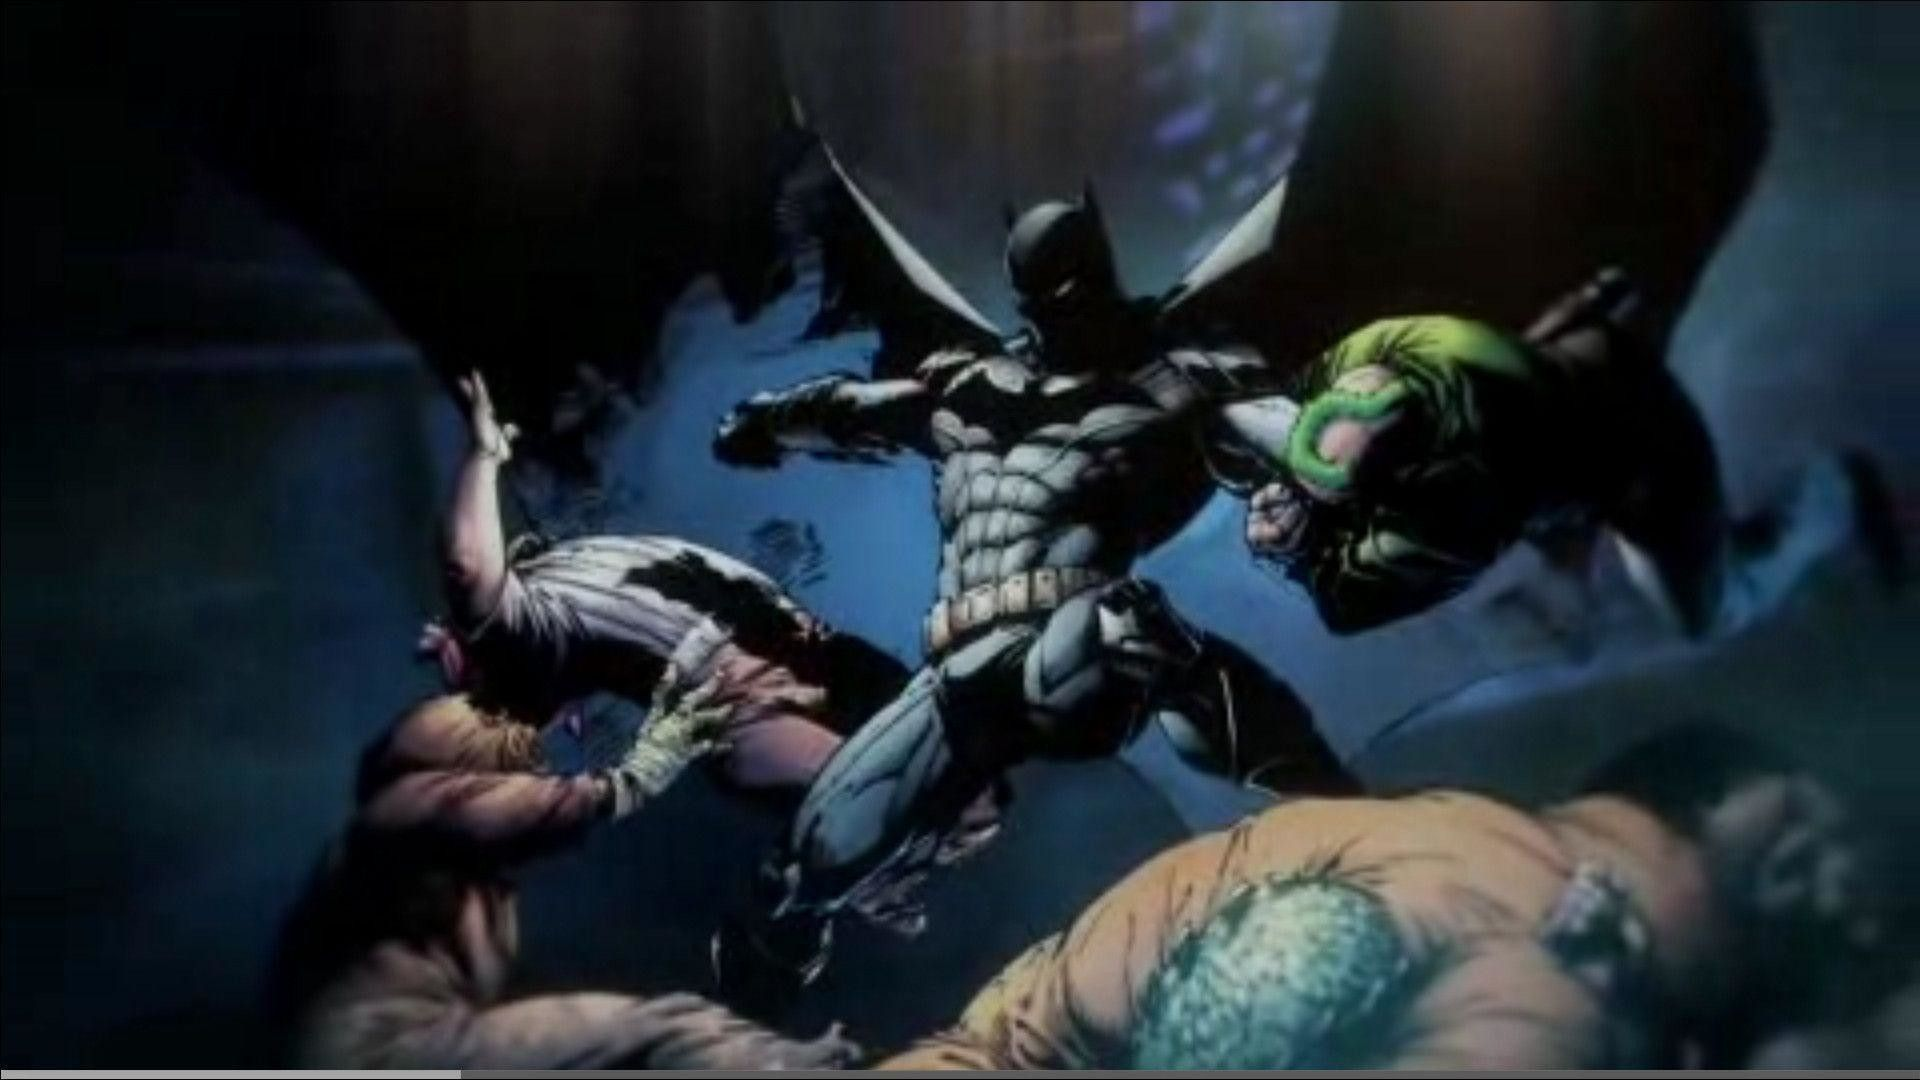 Batman New 52 Wallpapers Top Free Batman New 52 Backgrounds Images, Photos, Reviews